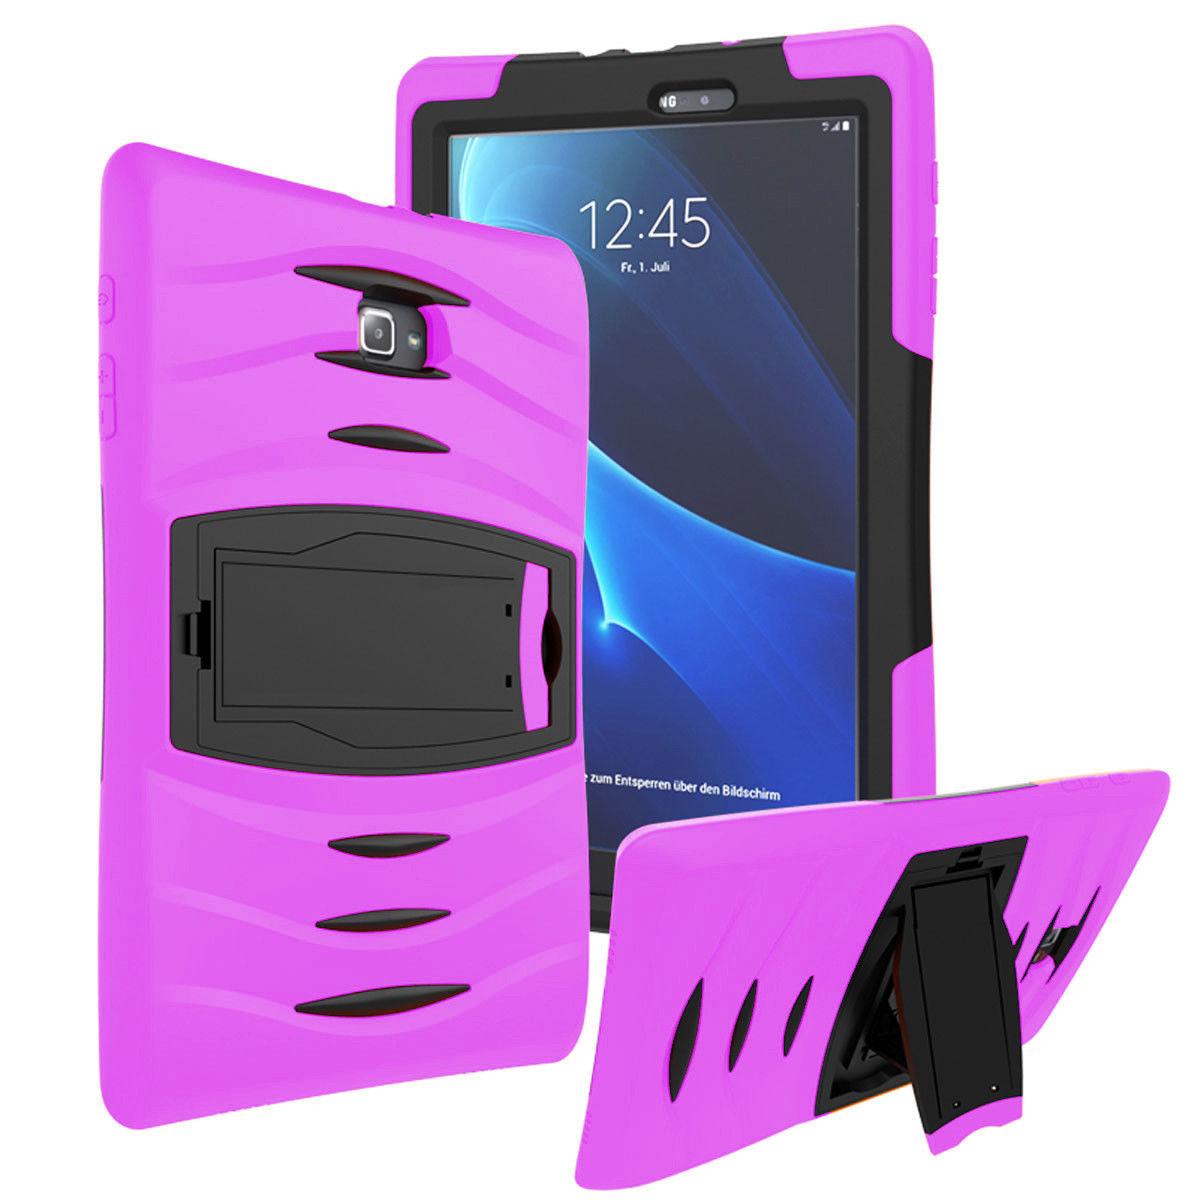 Galaxy Tab E 9.6 Case Cover by KIQ Shockproof Heavy Duty Armor Kickstand Screen Protector [SM-T560, SM-T561, SM-T560NU, SM-T560NZ] (Black)